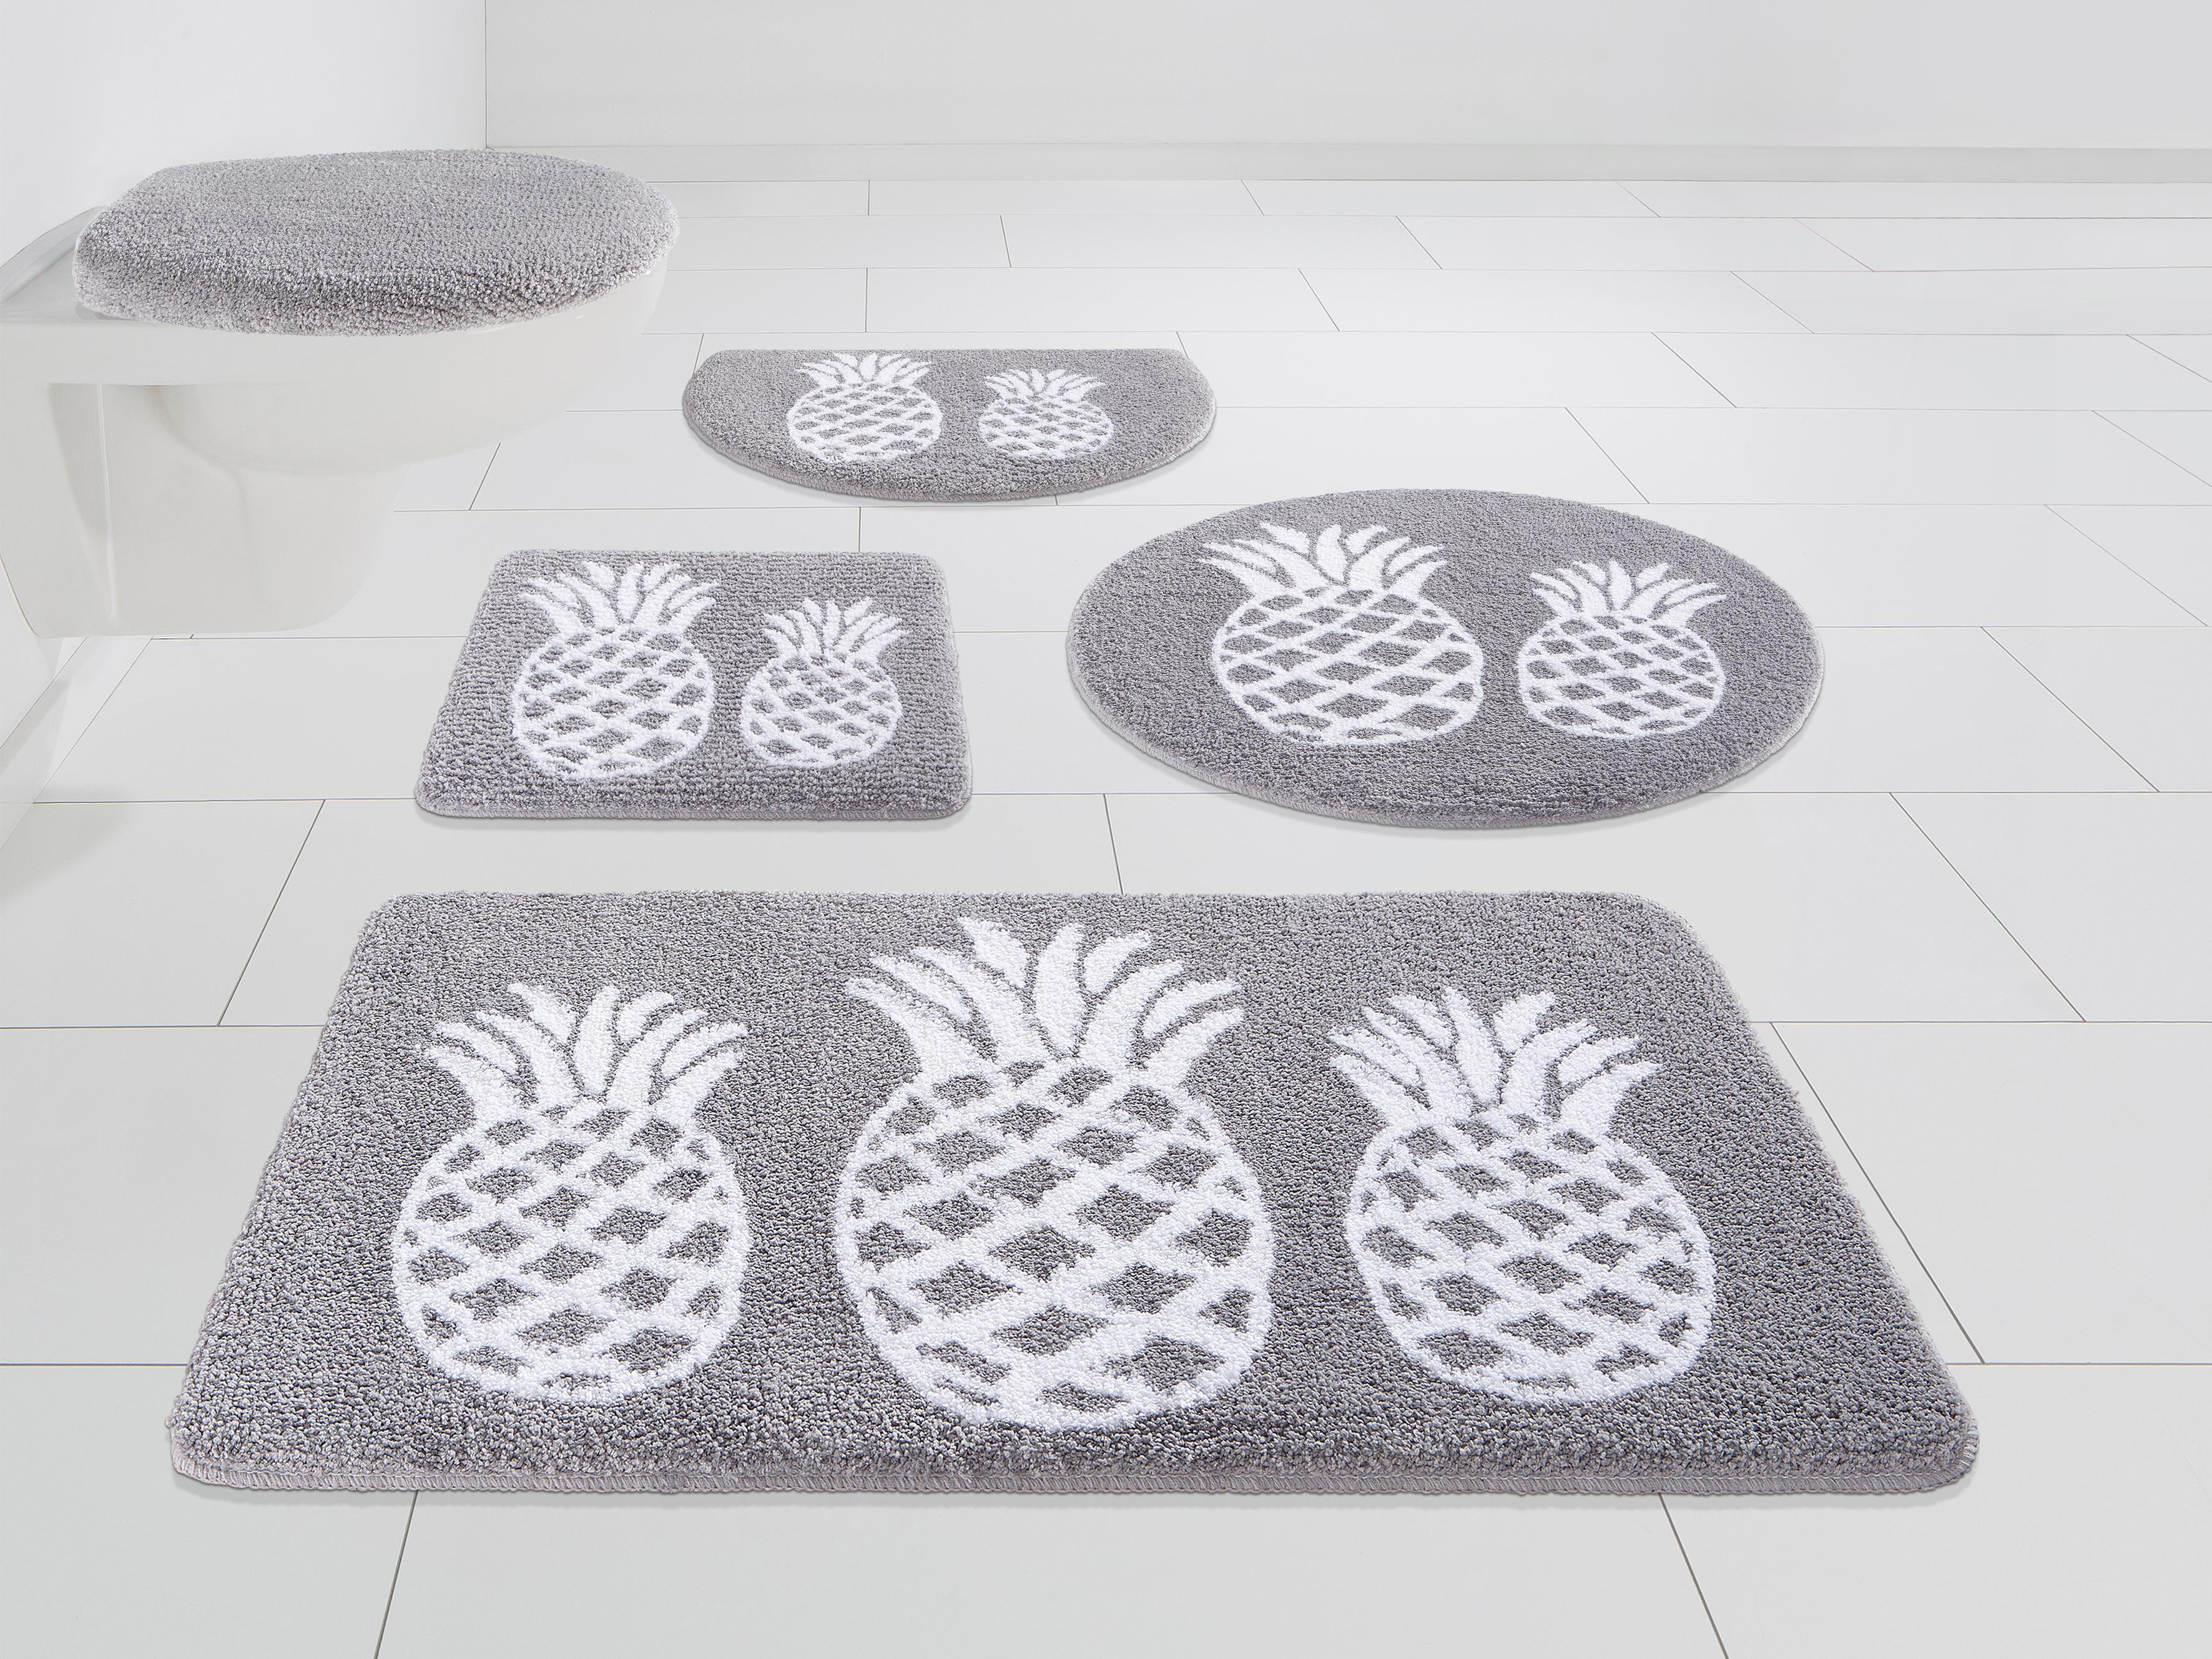 Badematte Ananas my home Höhe 12 mm strapazierfähig